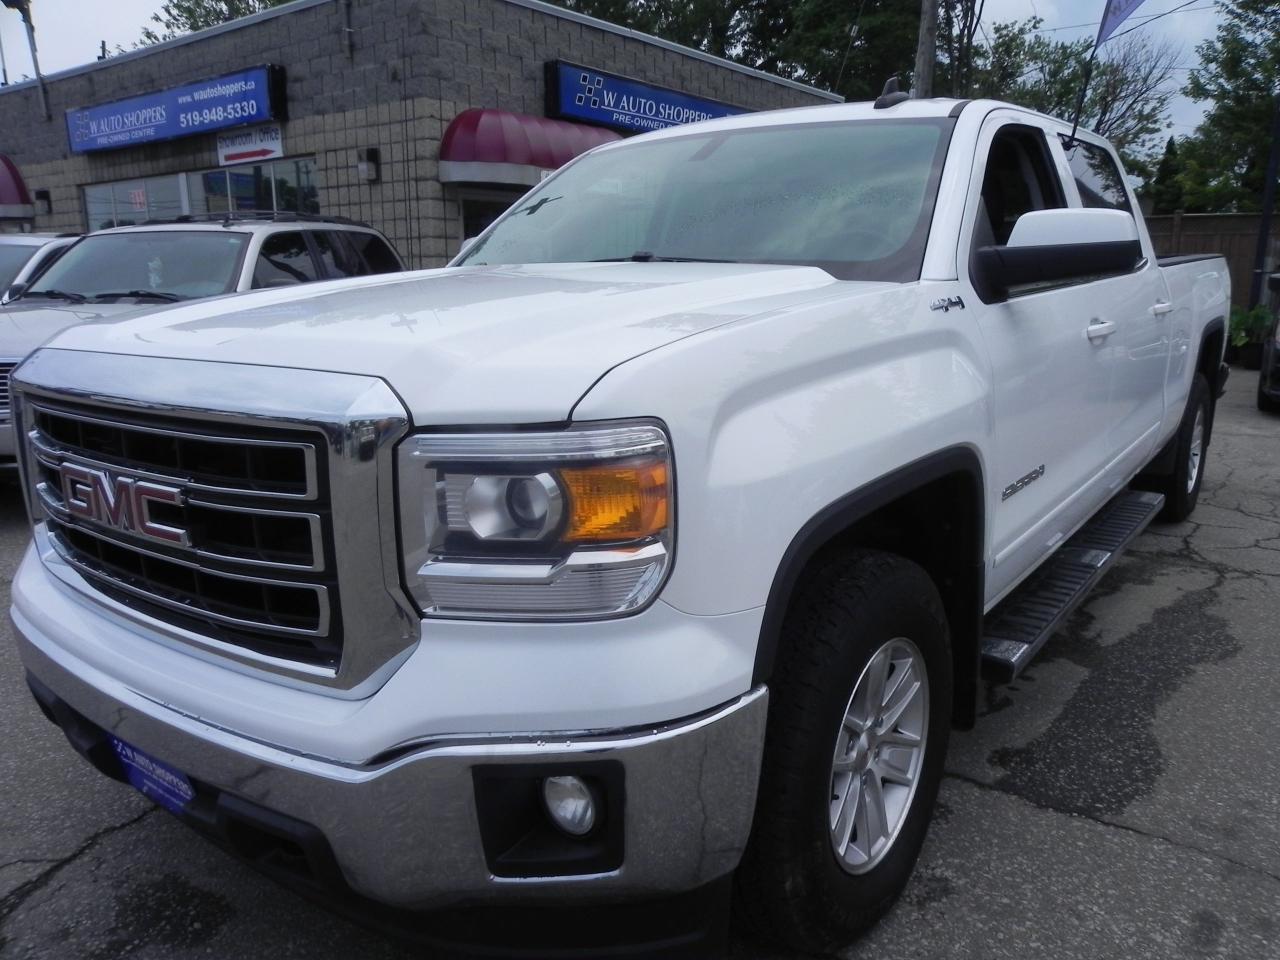 Photo of White 2015 GMC Sierra 1500